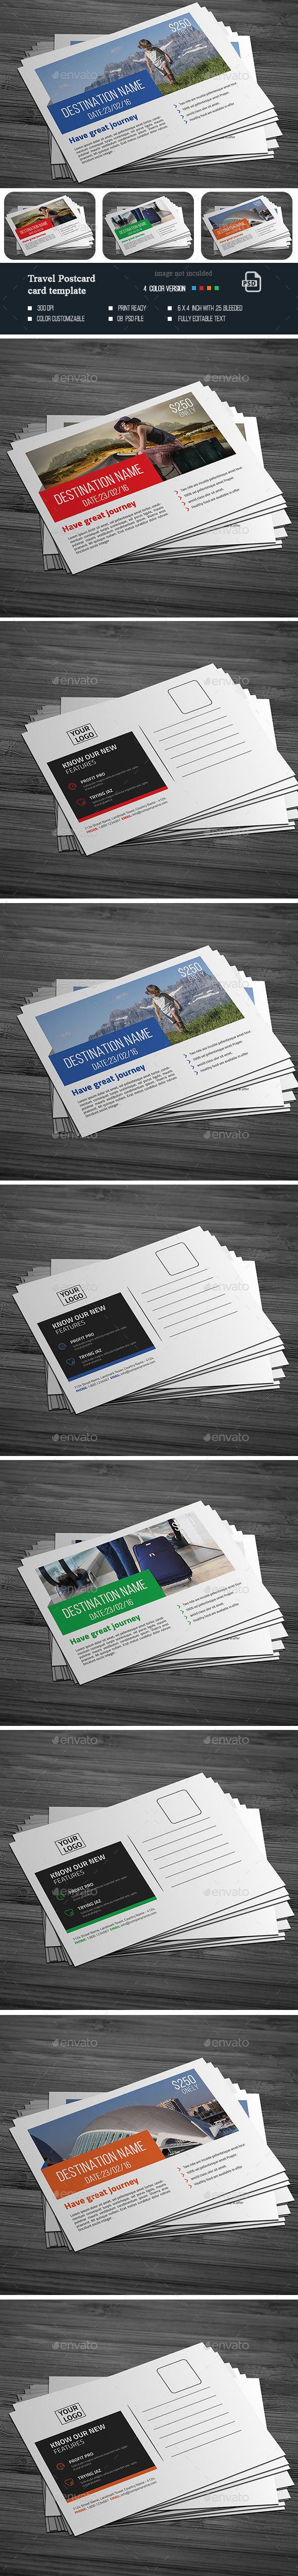 Travel Post Card  - Cards & Invites Print Templates